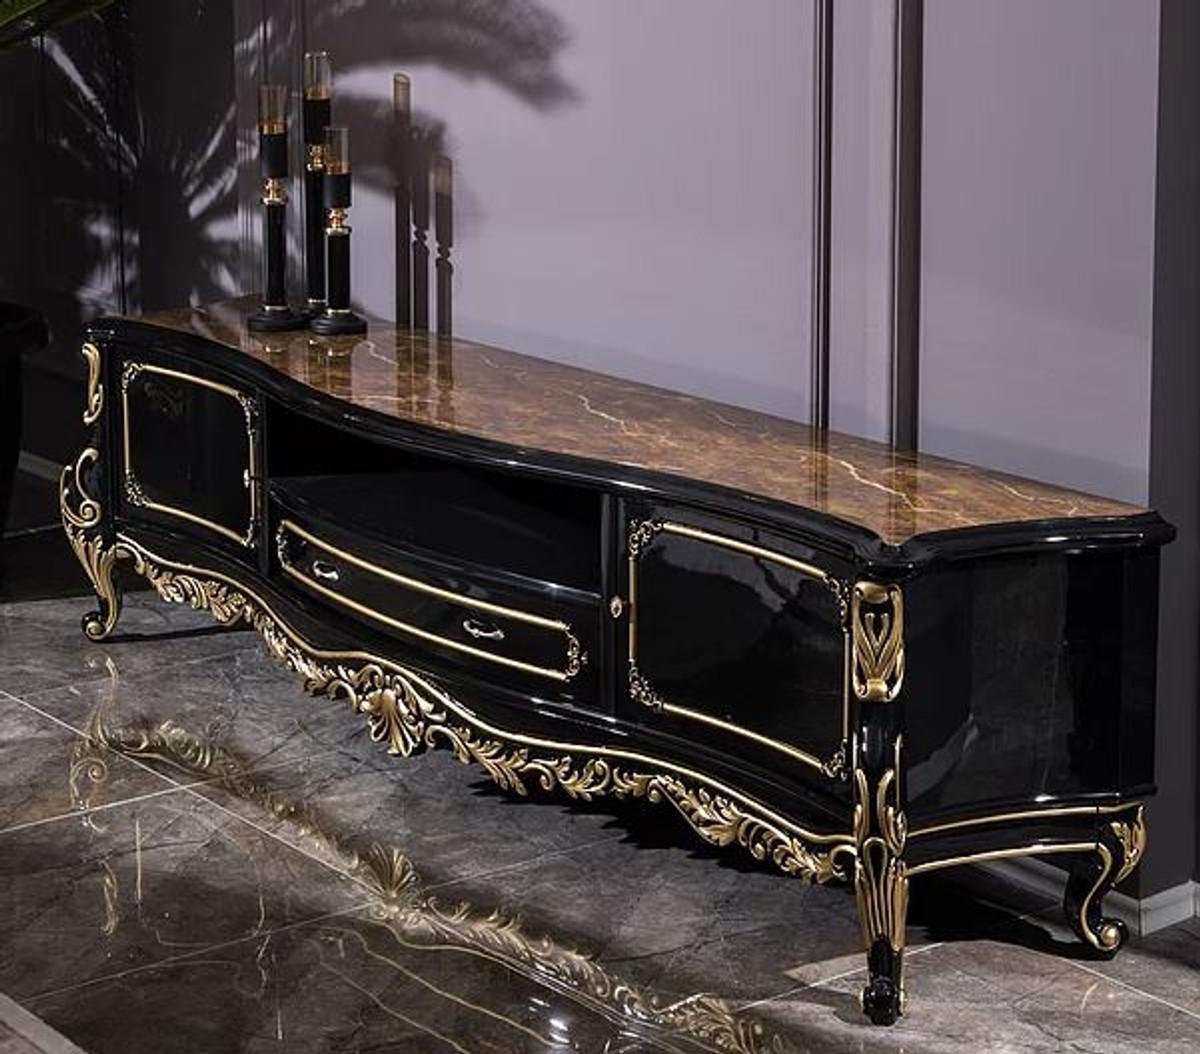 casa padrino armoire tv baroque de luxe noir or 228 x 48 x h 61 cm magnifique meuble tv en bois massif mobilier de salon baroque